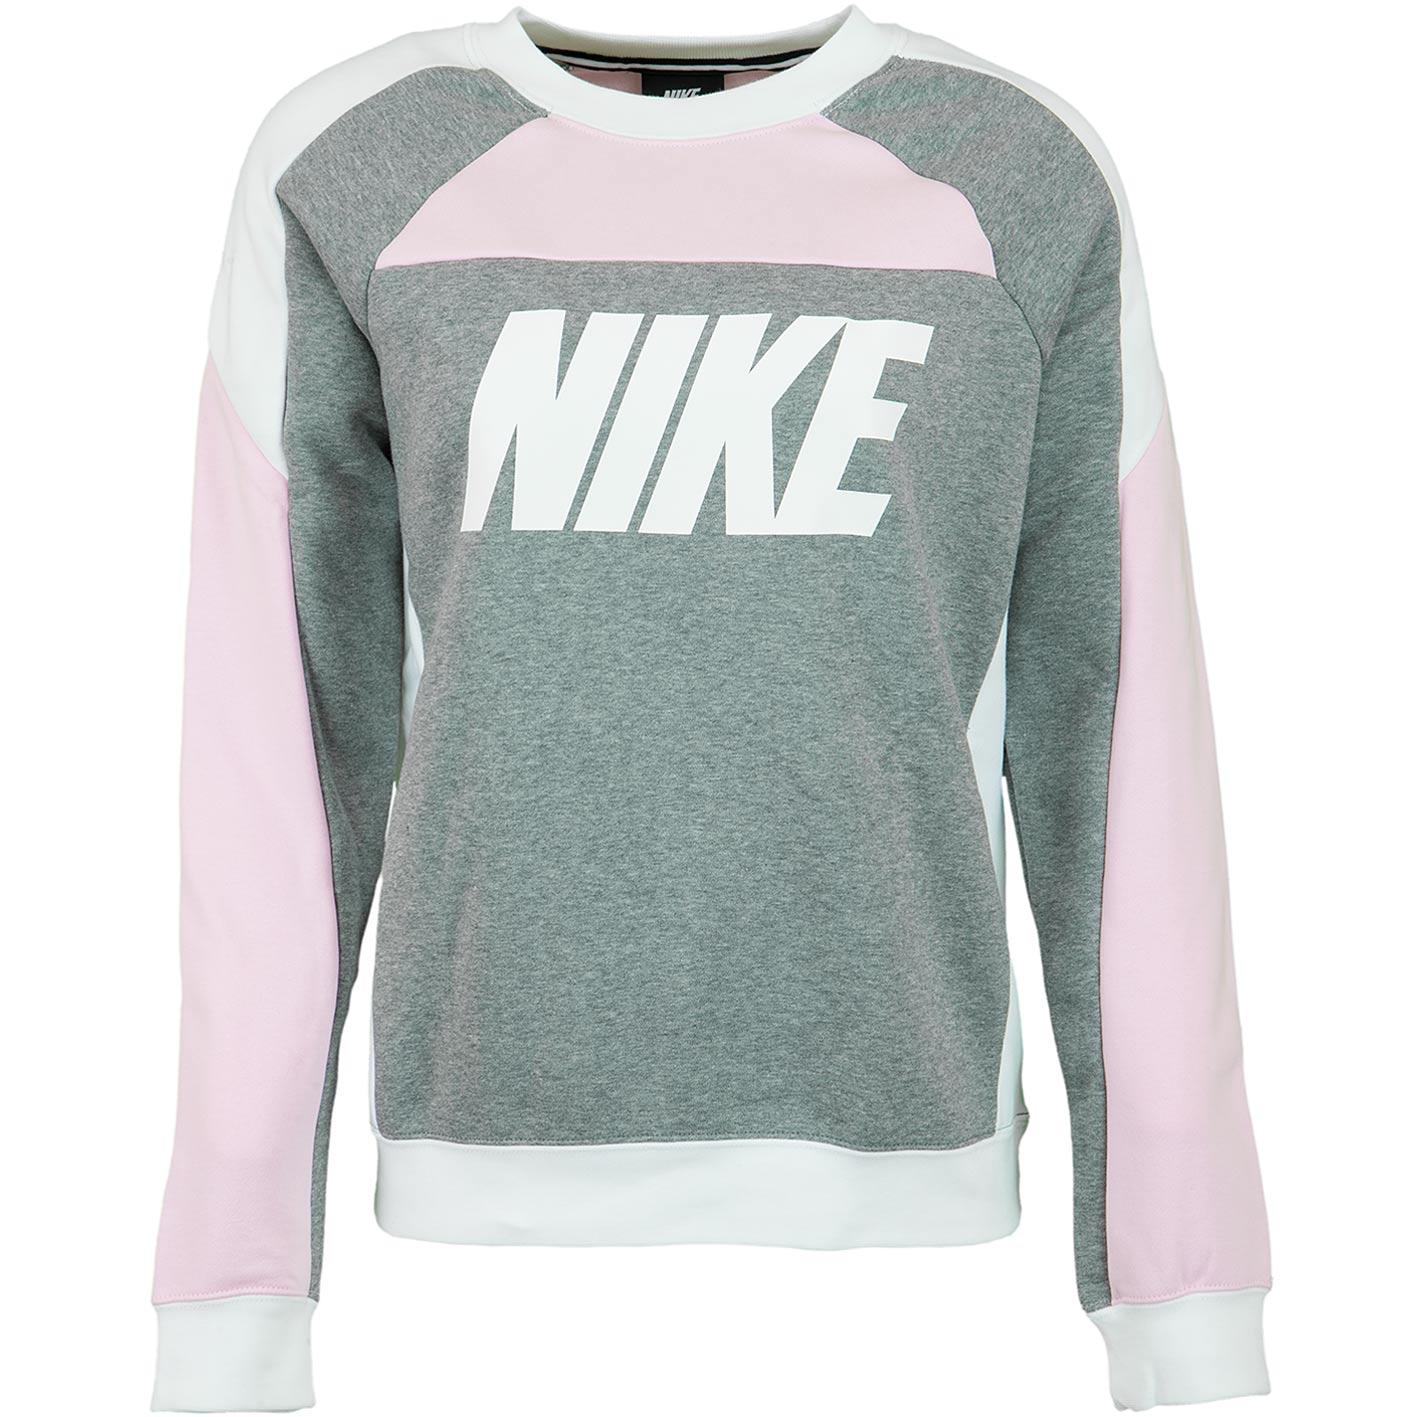 Nike Damen Sweatshirt CB Fleece pinkweiß